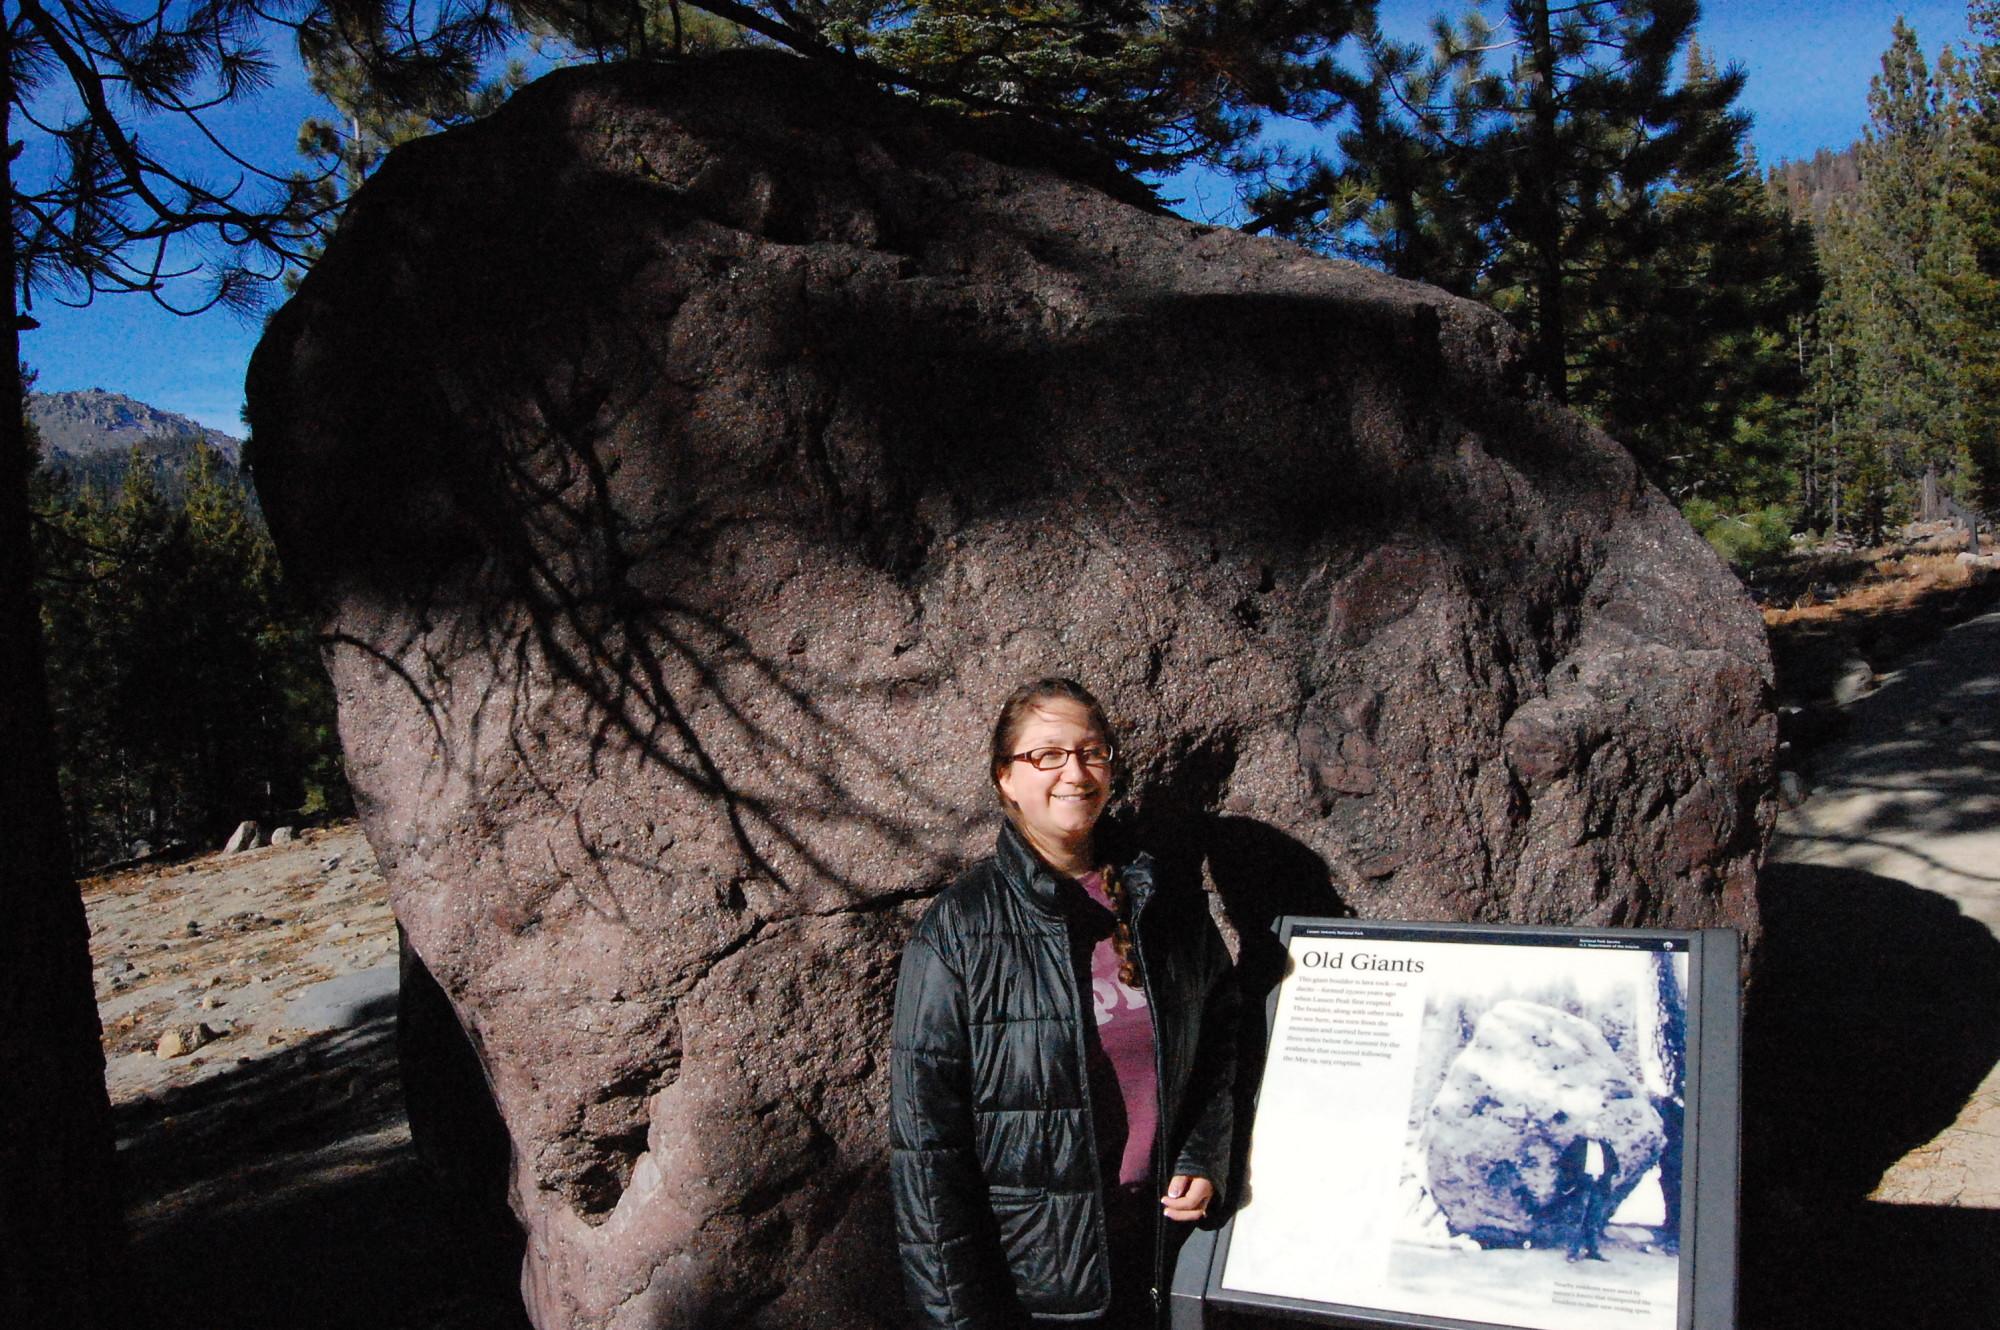 Gigantic boulder that was thrown from Lassen Peak to this spot in 1915